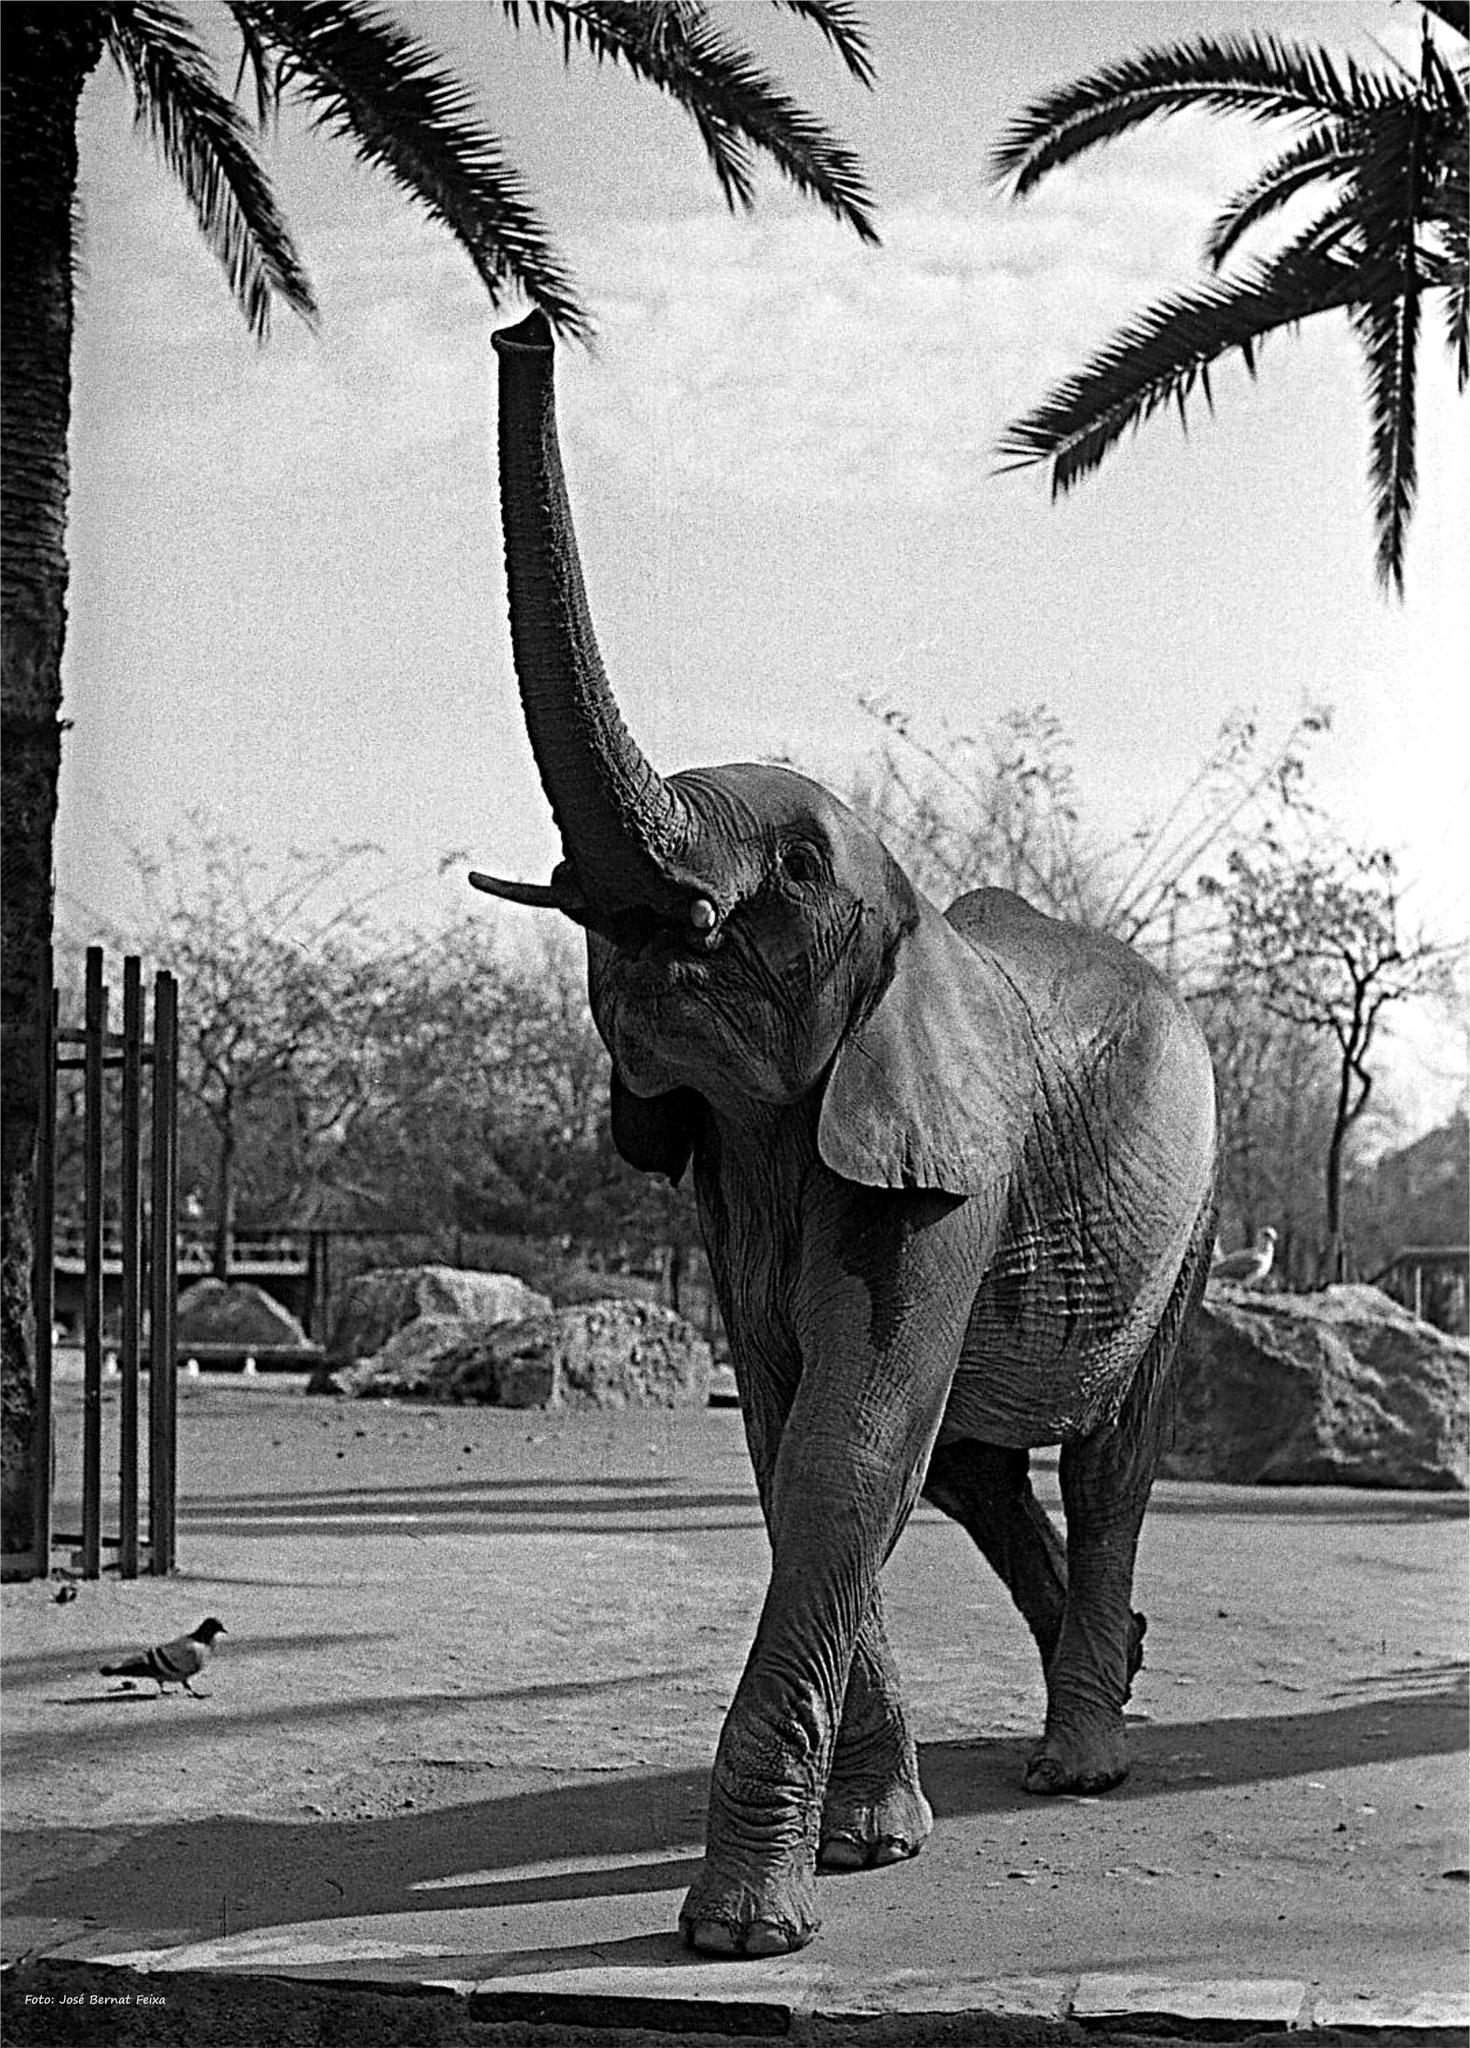 ELEFANTE JOVEN; JONGE OLIFANT; YOUNG ELEPHANT (60's) by José Bernat Feixa